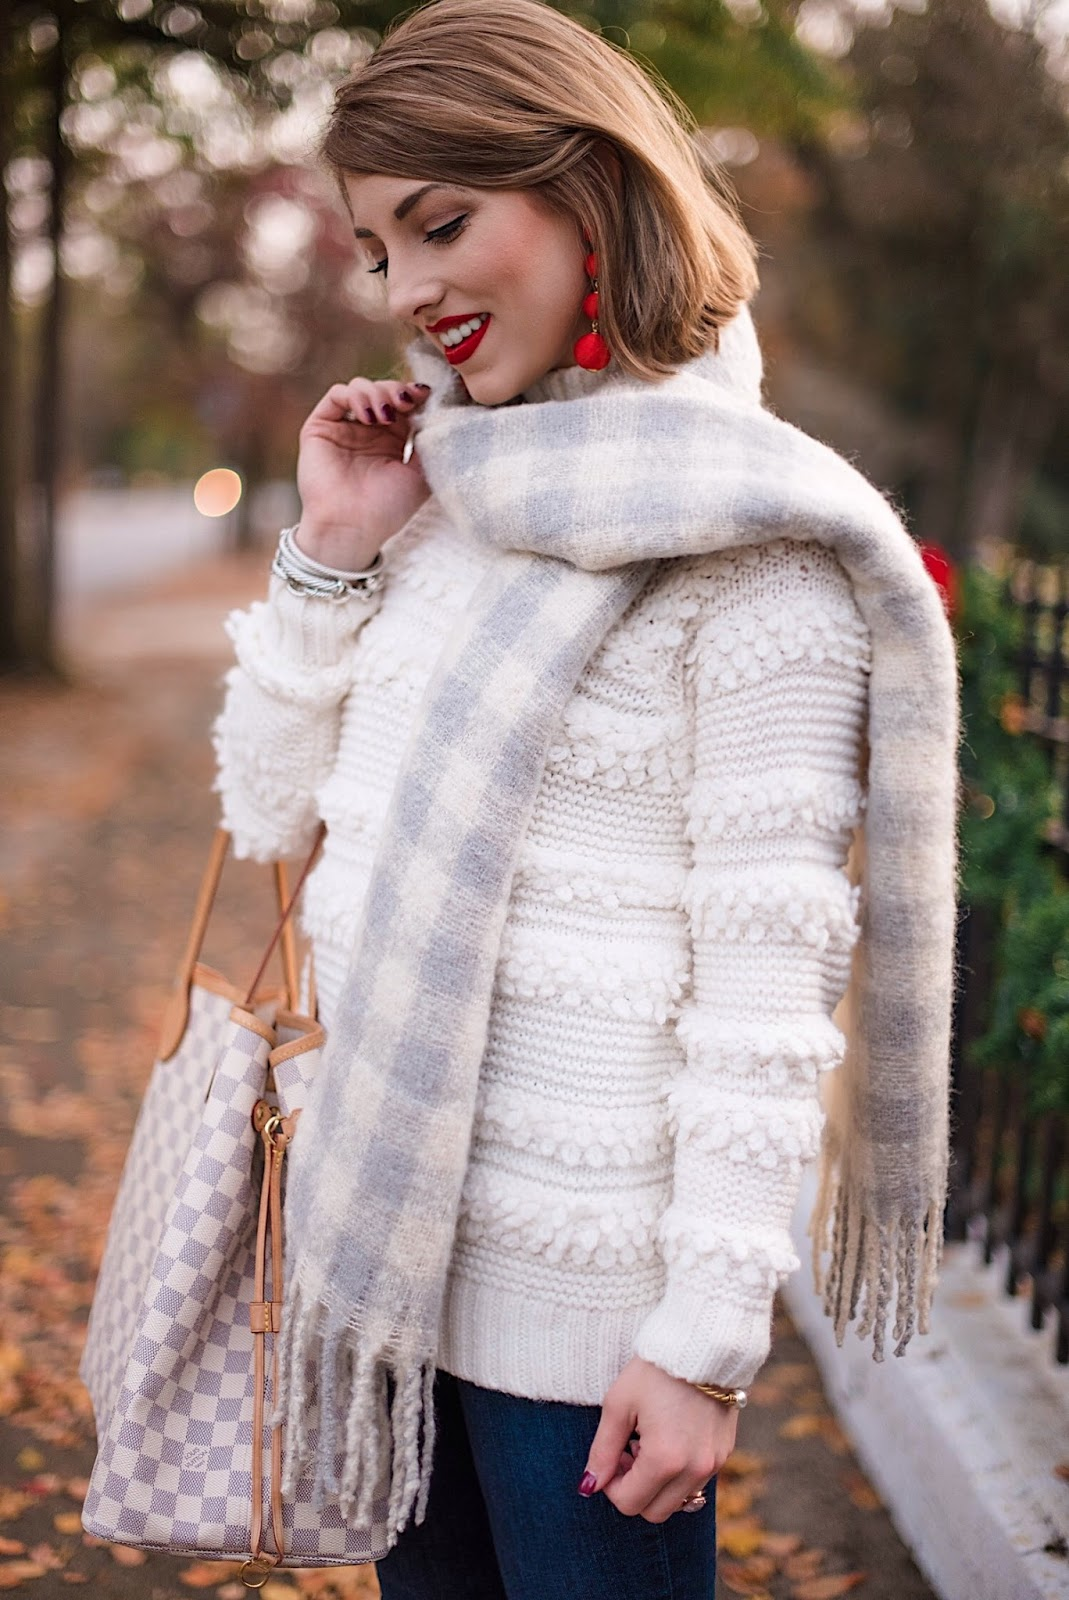 Baublebar Criselda Ball Drop Earrings - Something Delightful Blog